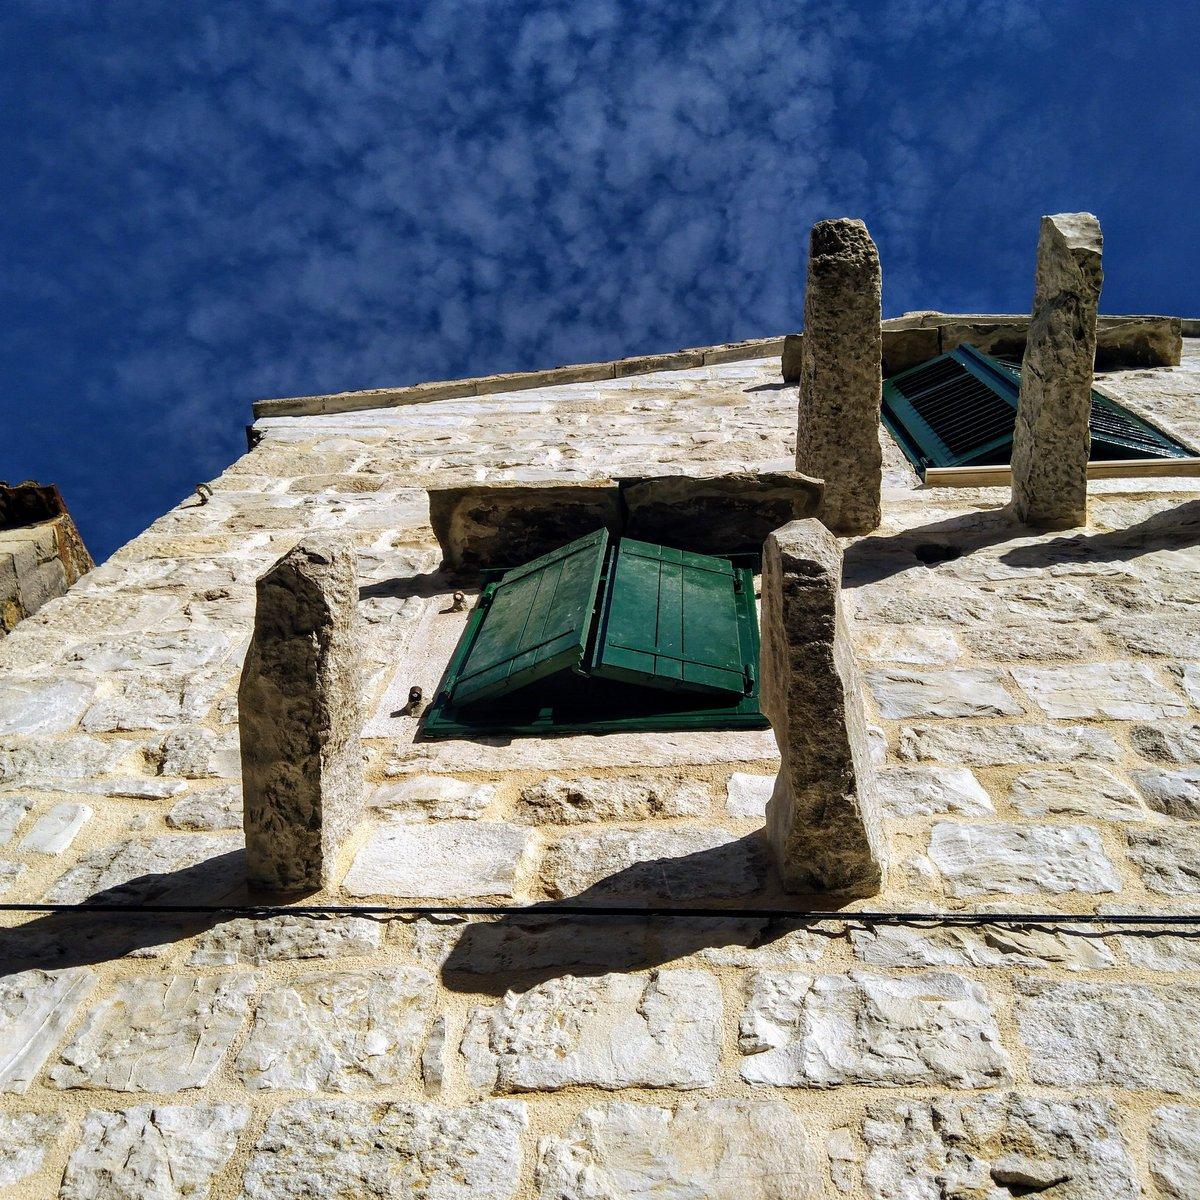 Dalmatian houses. Shot in #Split, Croatia. #Nokia6<br>http://pic.twitter.com/Mc6cZmXzZZ